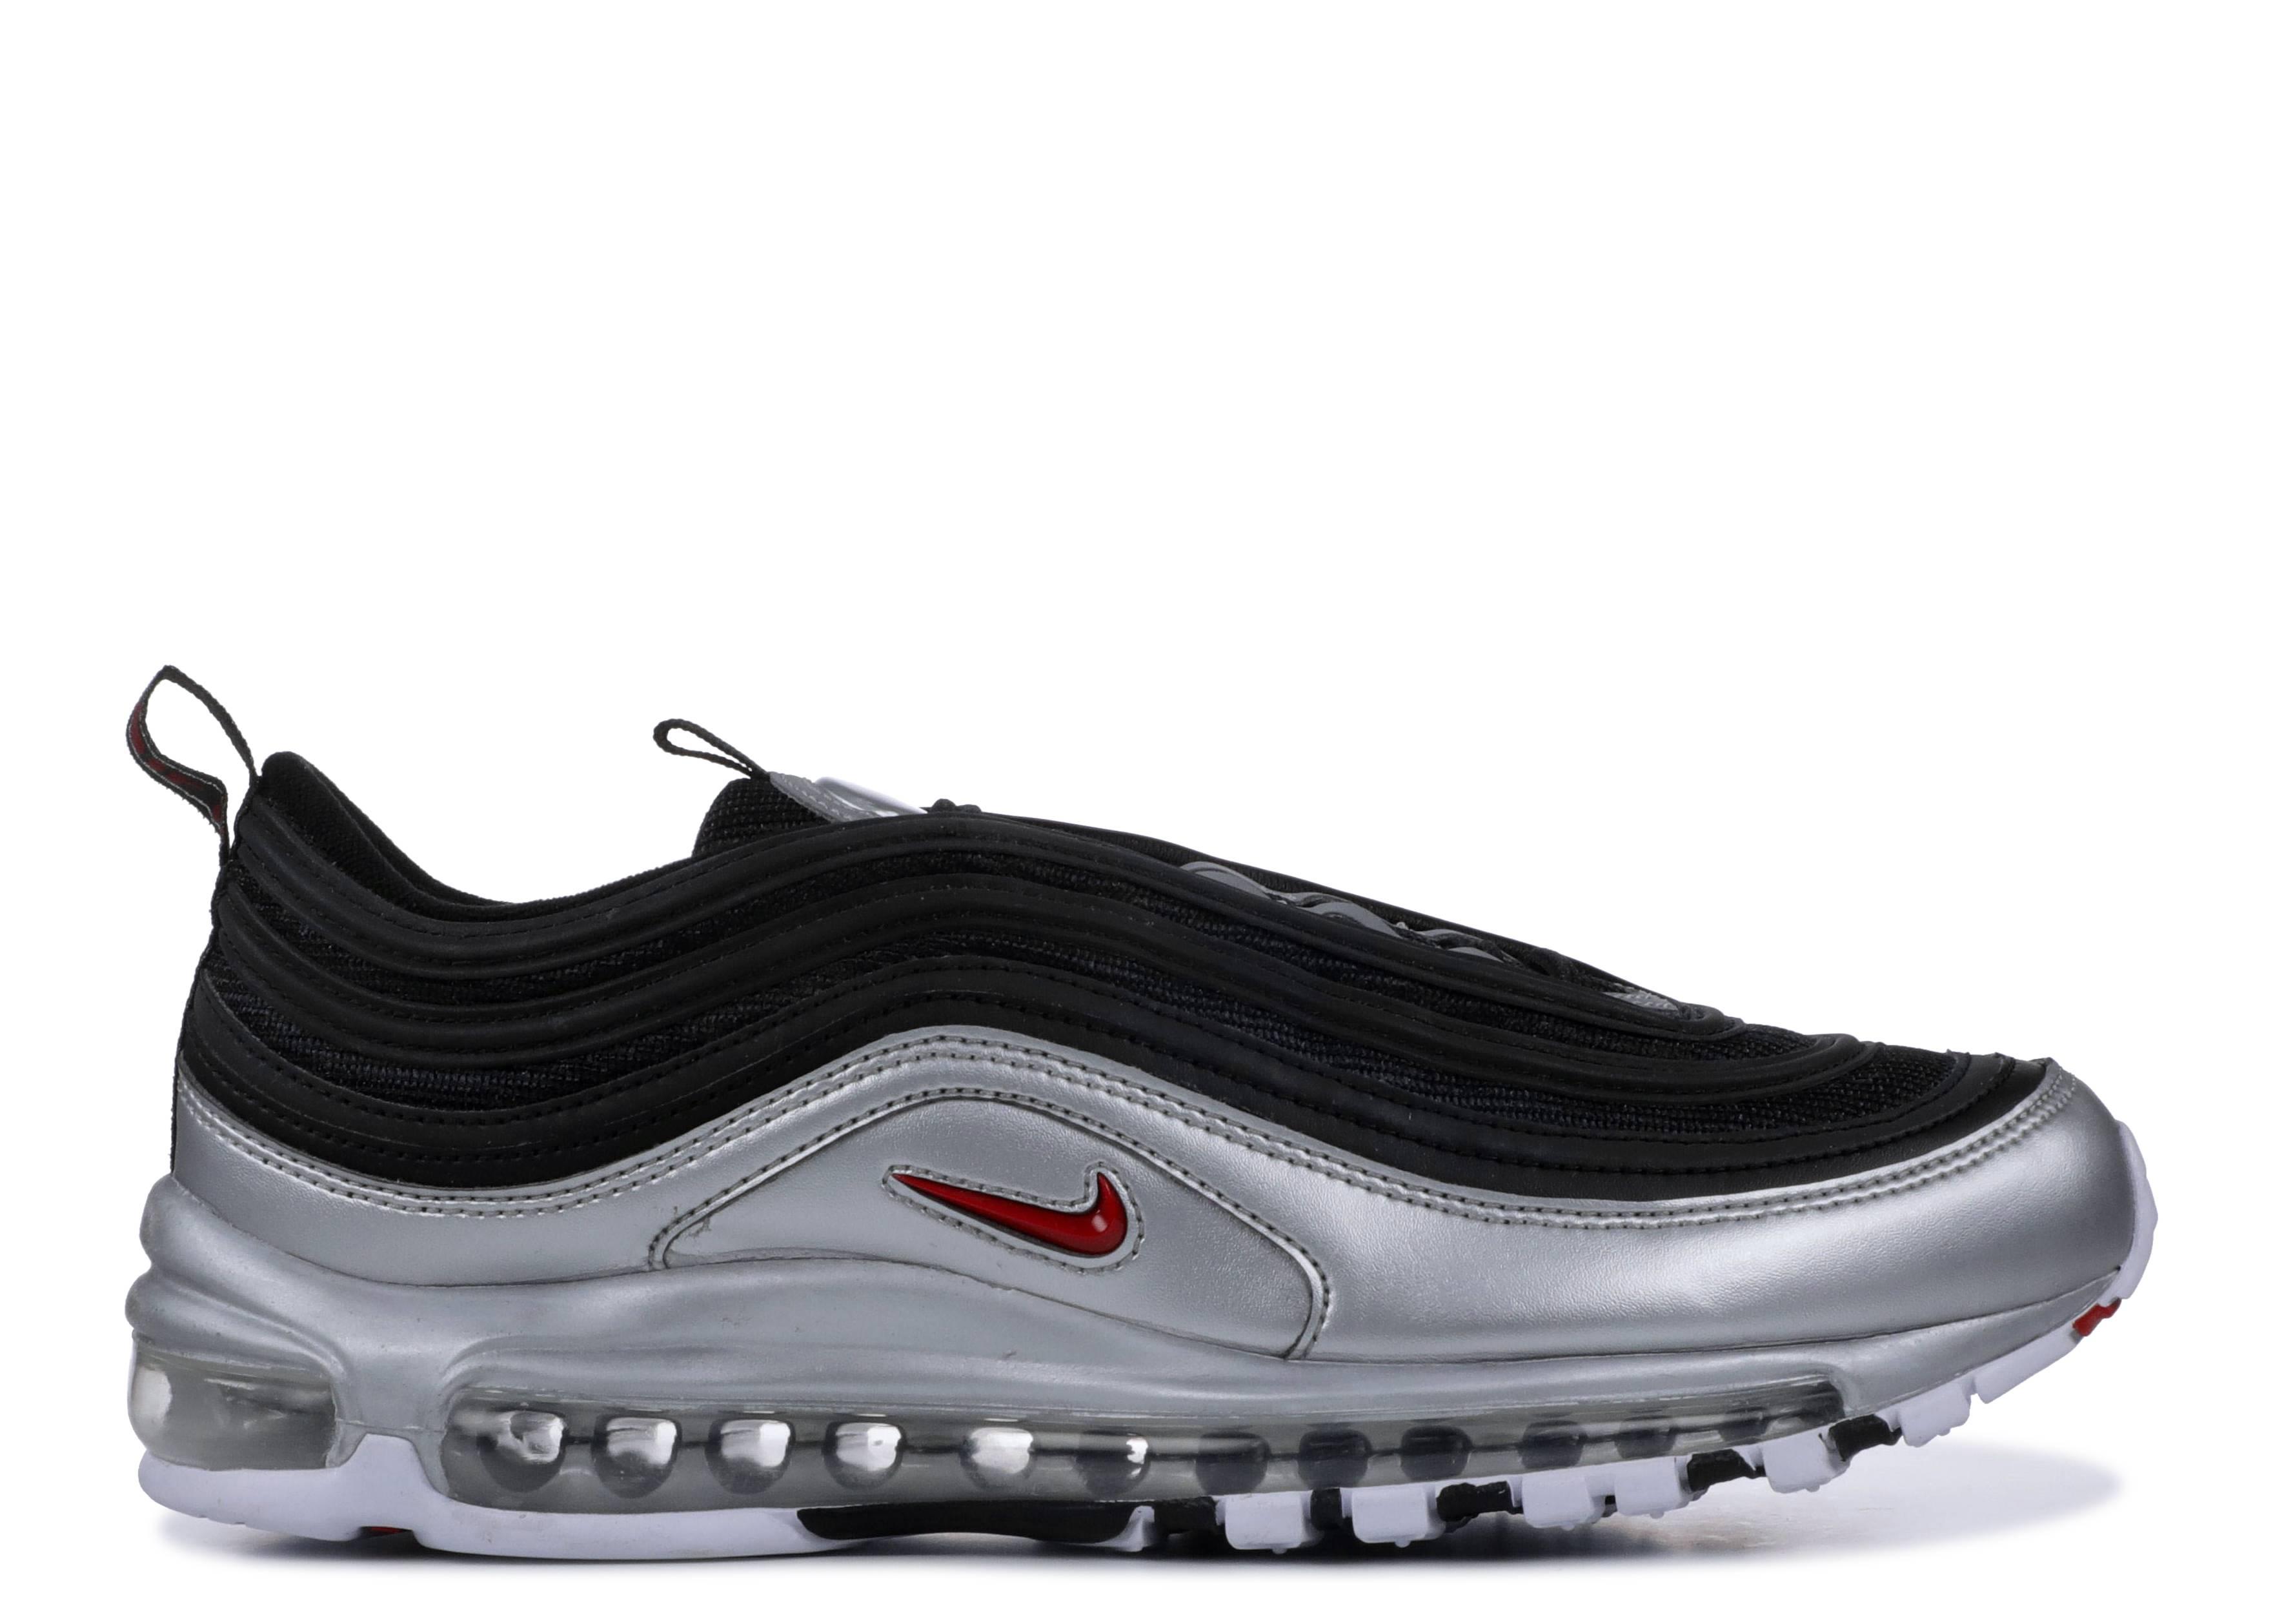 preocupación Recomendación Lectura cuidadosa  Air Max 97 QS 'B Sides Metallic Silver' - Nike - AT5458 001 - black/varsity  red-metallic silver-white | Flight Club